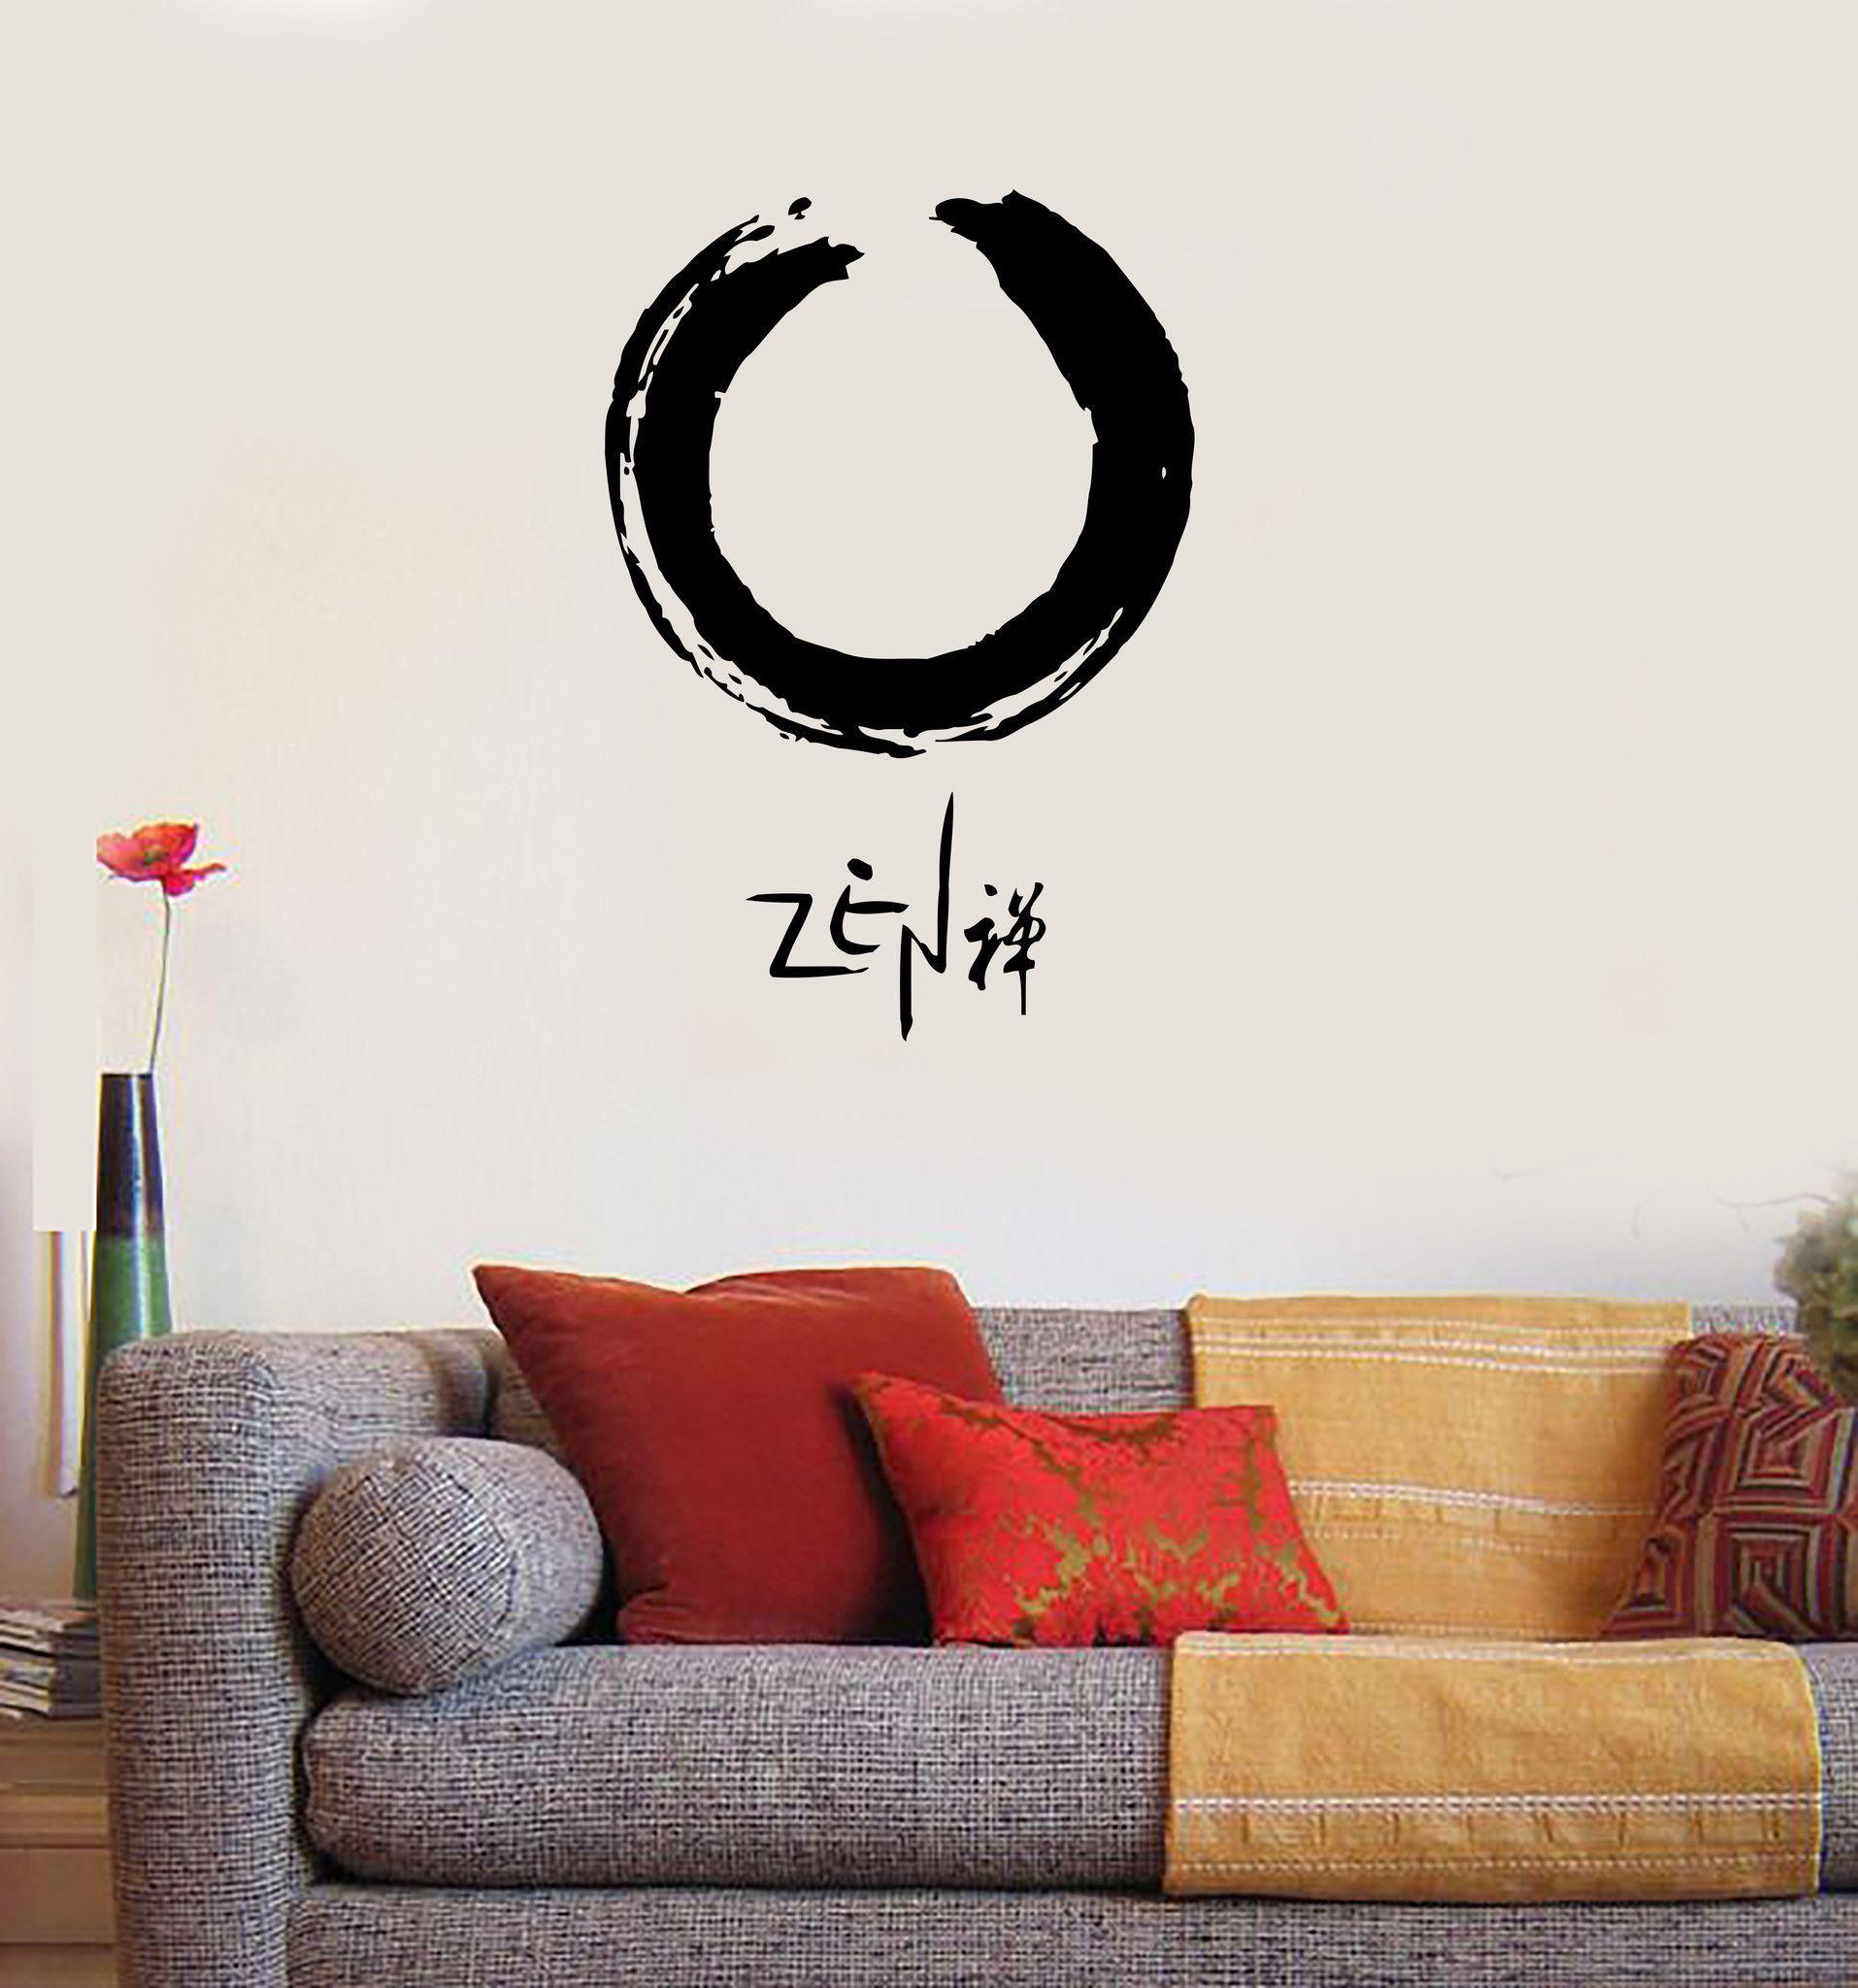 Vinyl Decal Buddha Zen Enso Circle Yoga Oriental Meditation - Zen wall decalsvinyl wall decal yin yang yoga zen meditation bedroom decor